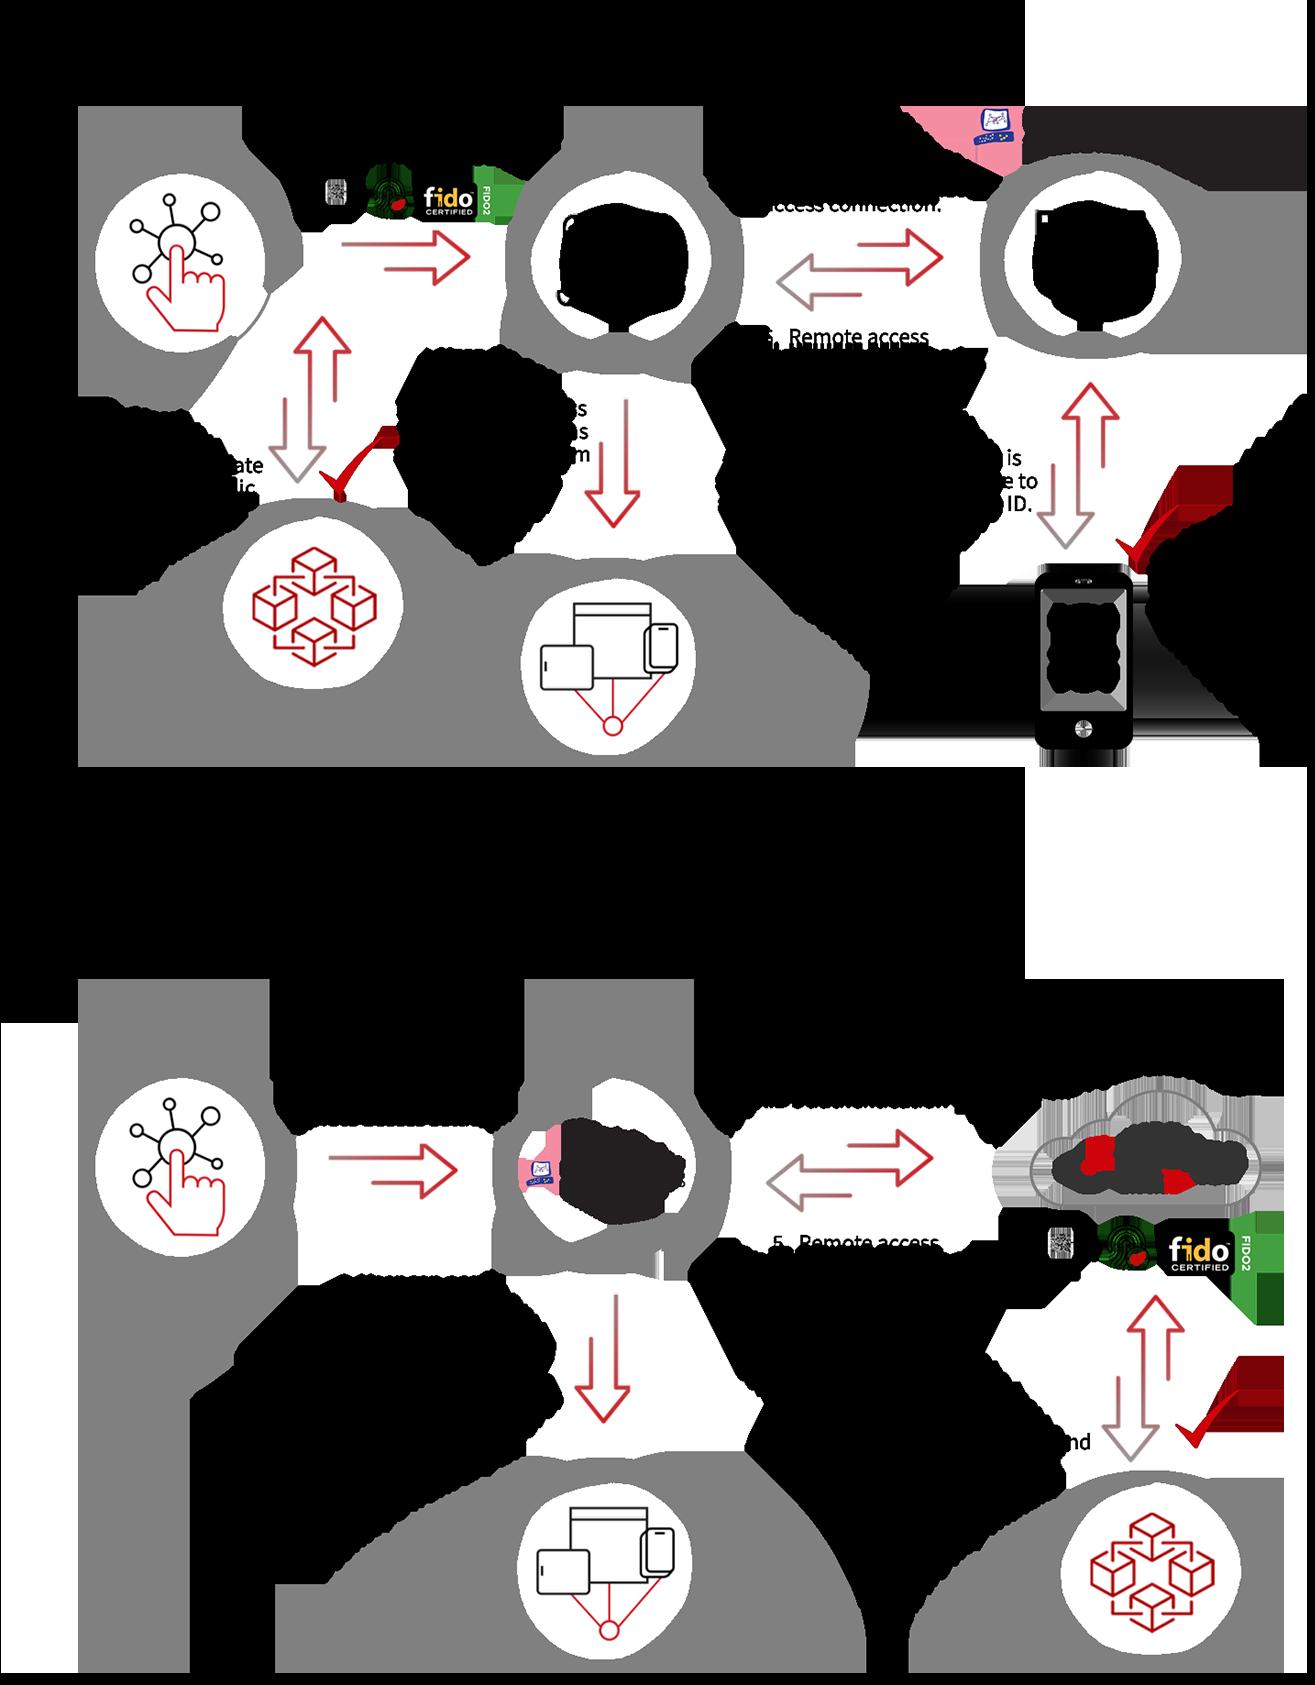 checkpoint diagram scenario 1 and 2